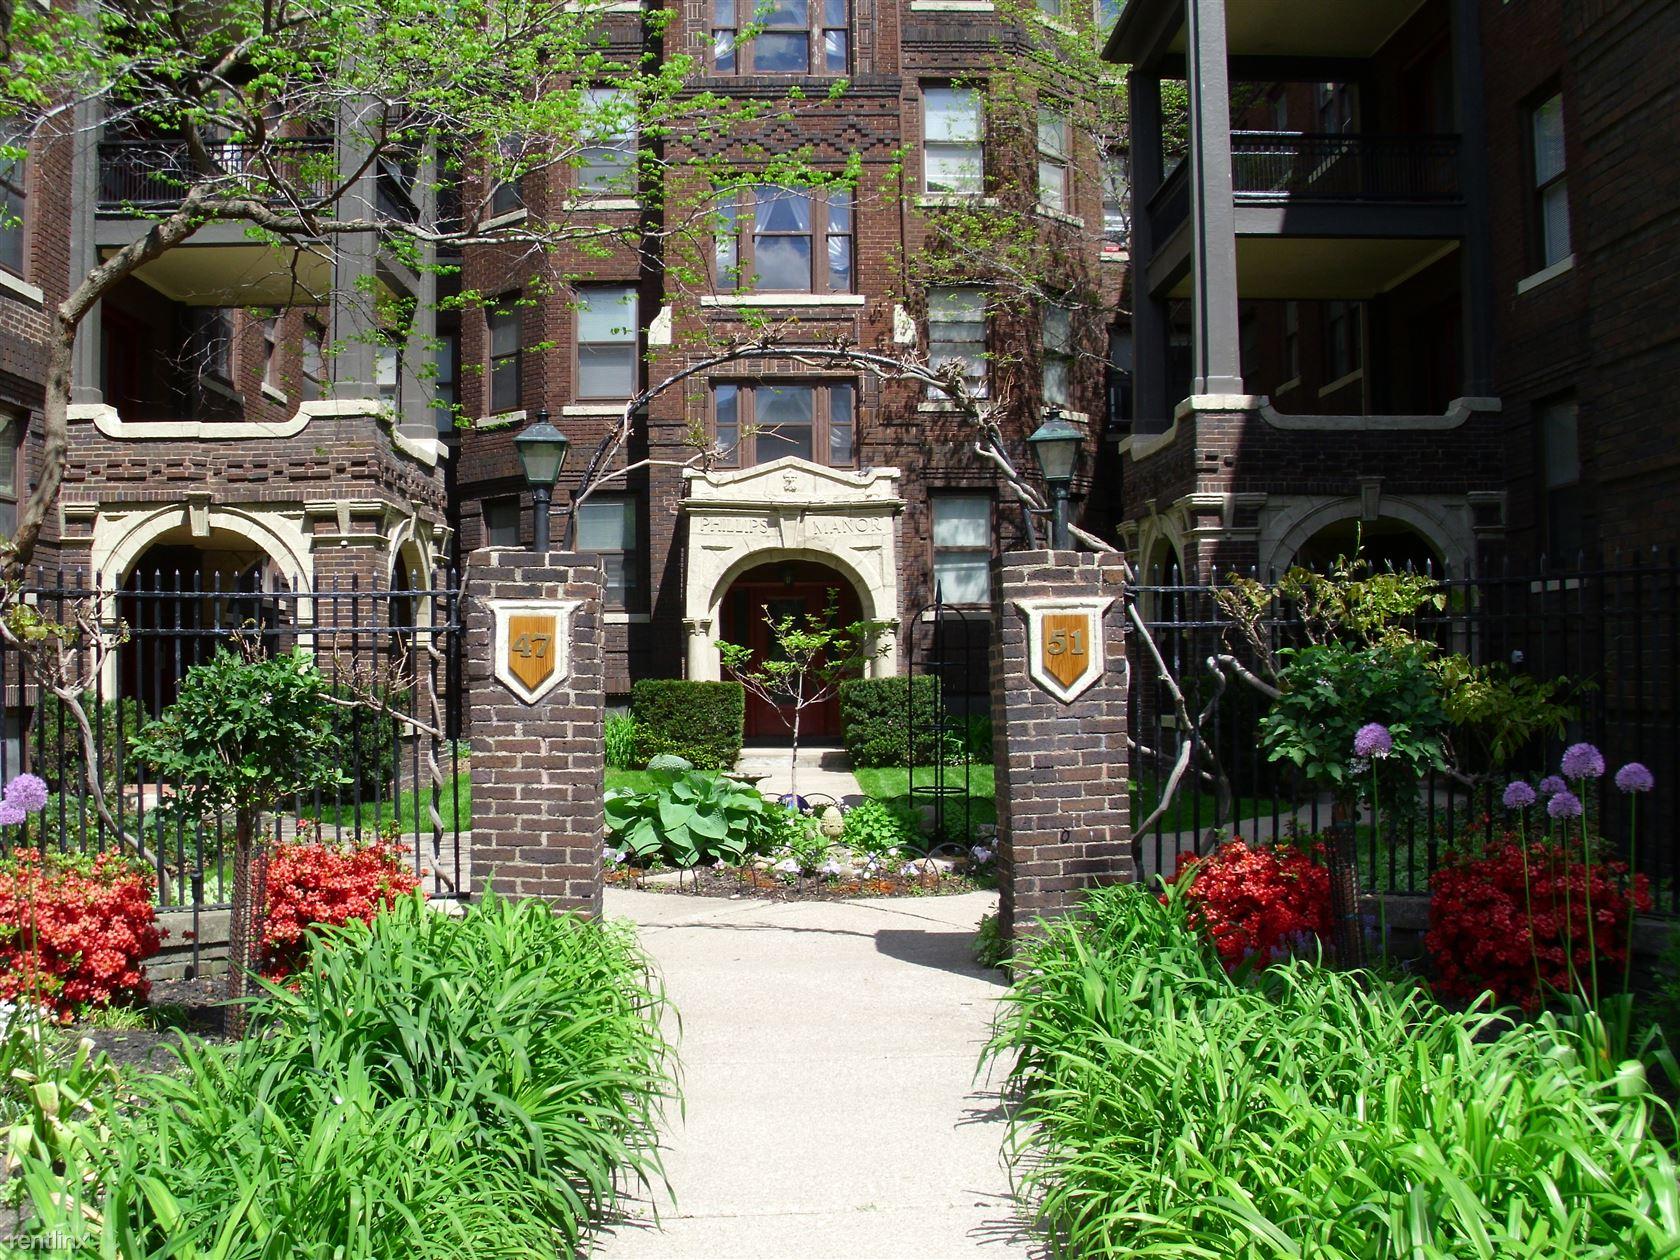 Phillips Manor Apartments